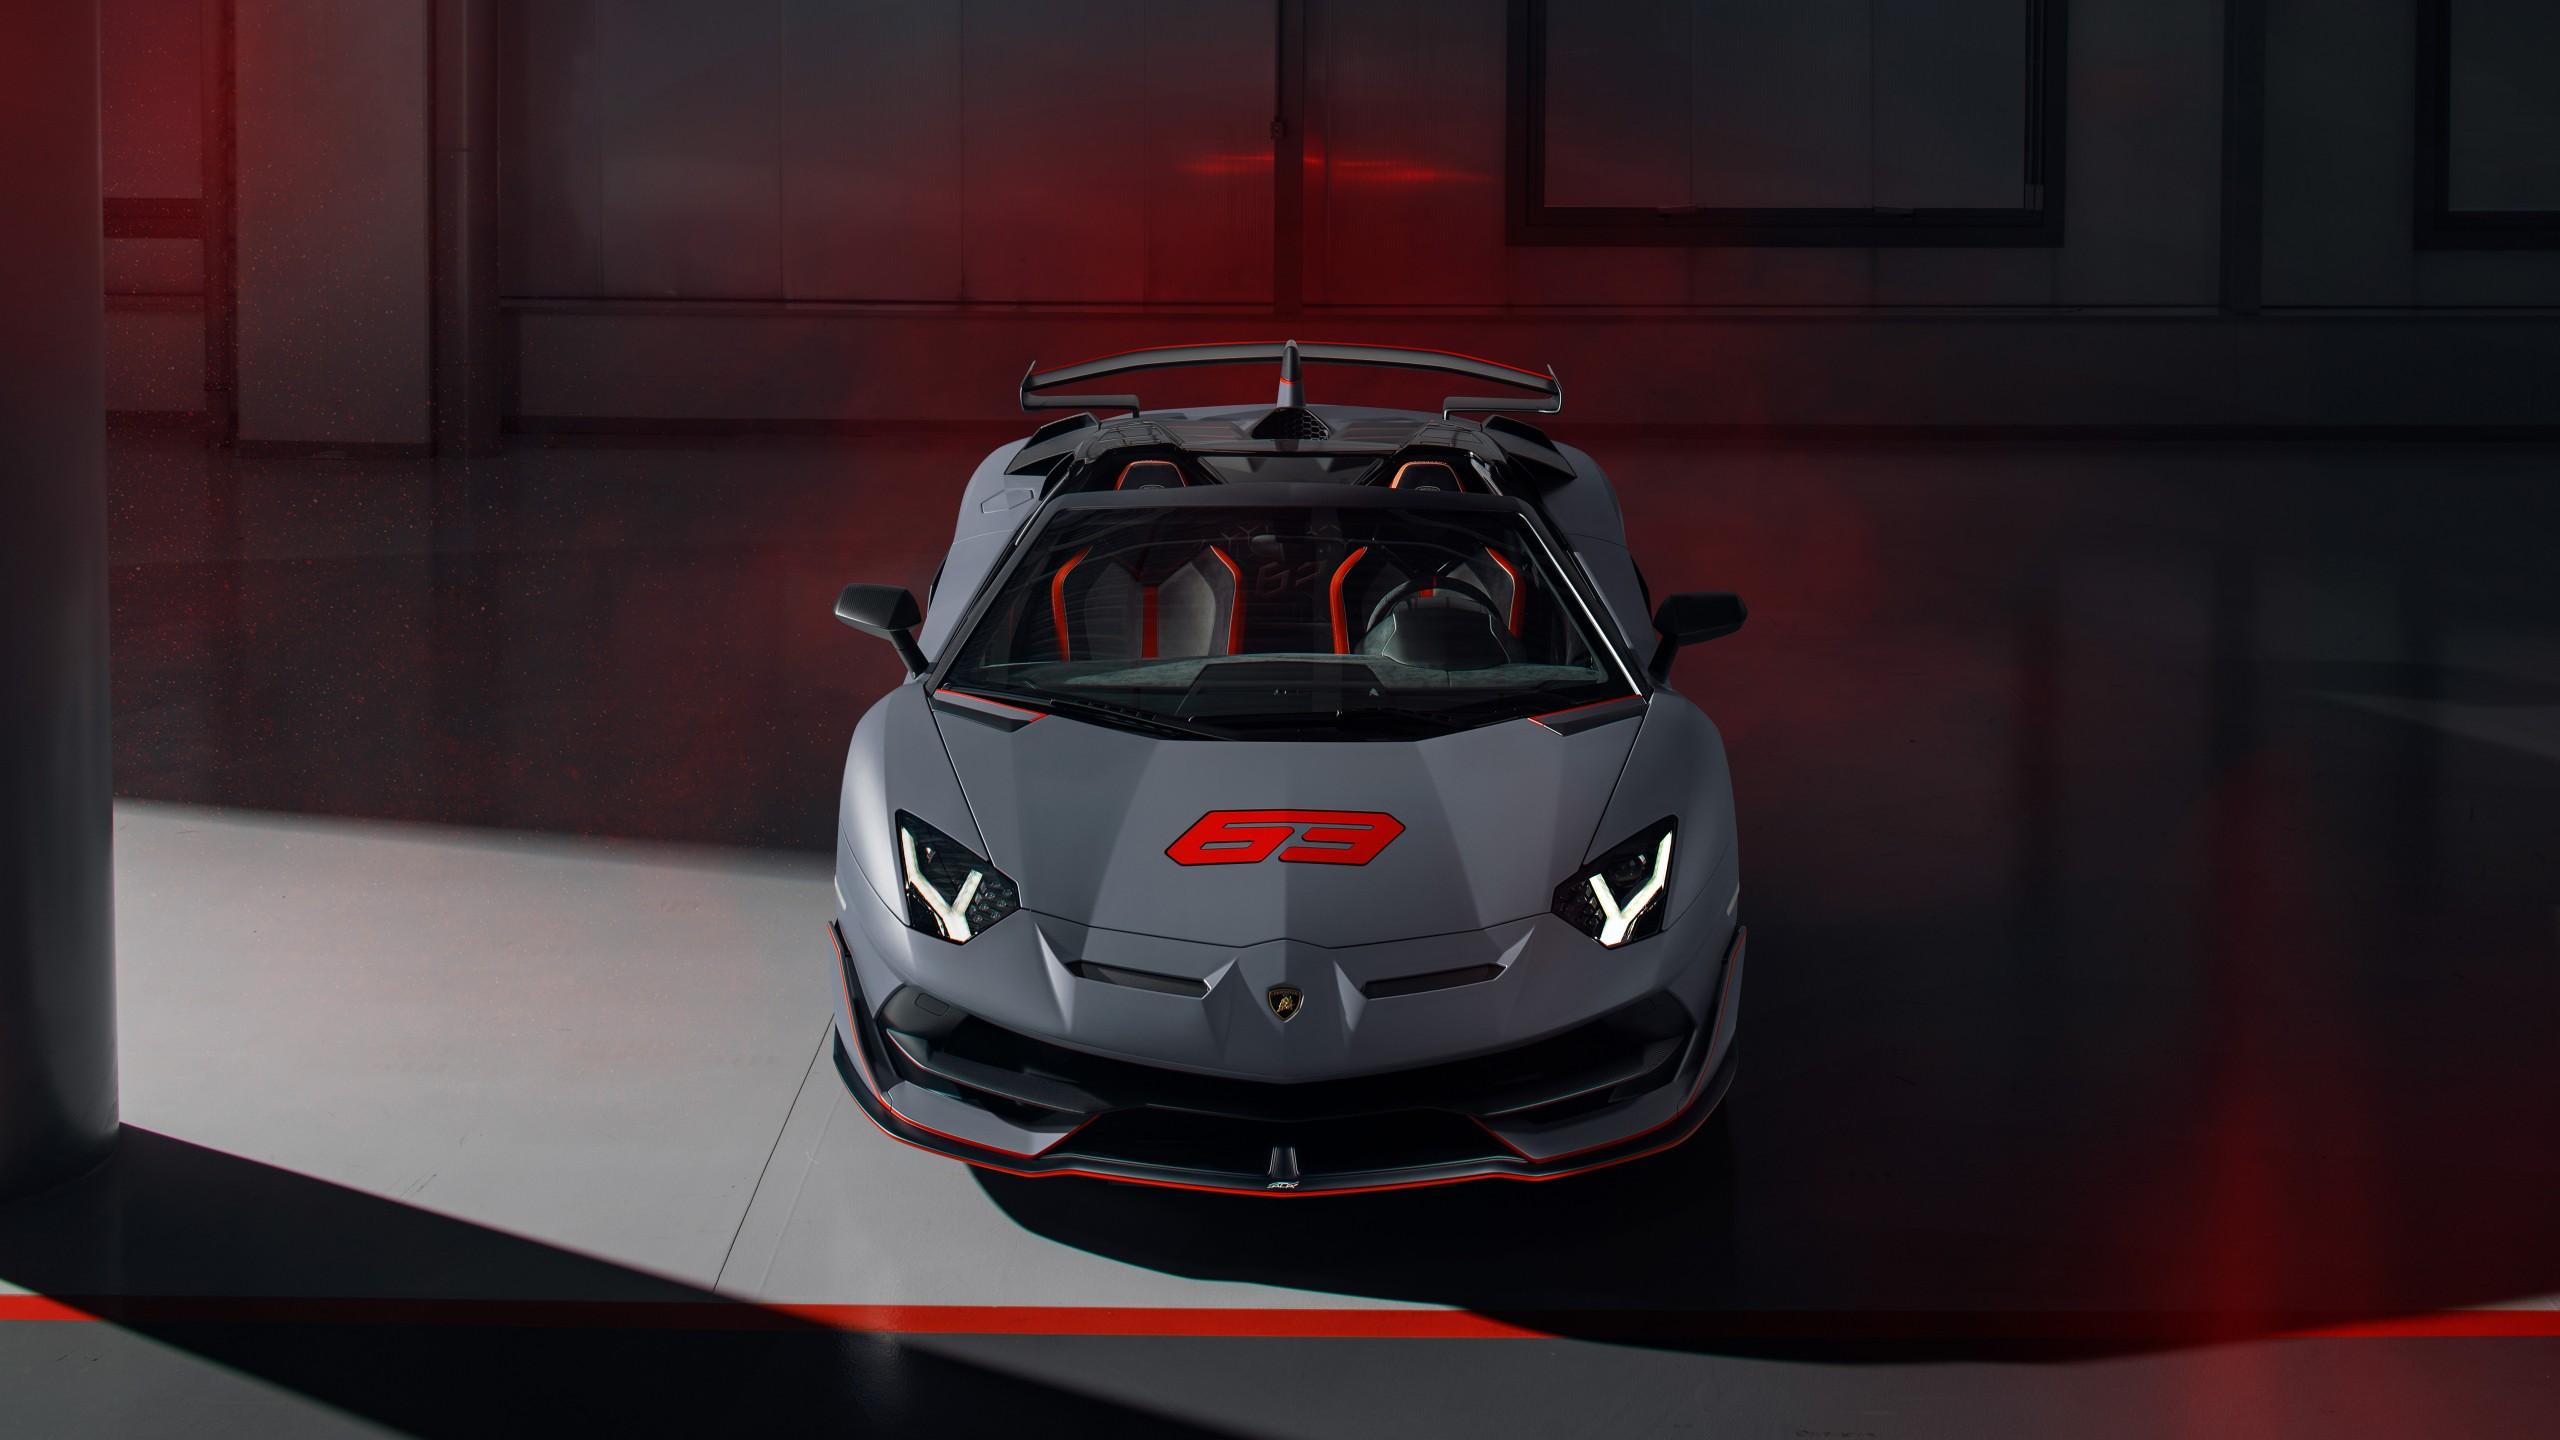 Lamborghini Aventador SVJ 63 Roadster 2020 4K Wallpaper ...